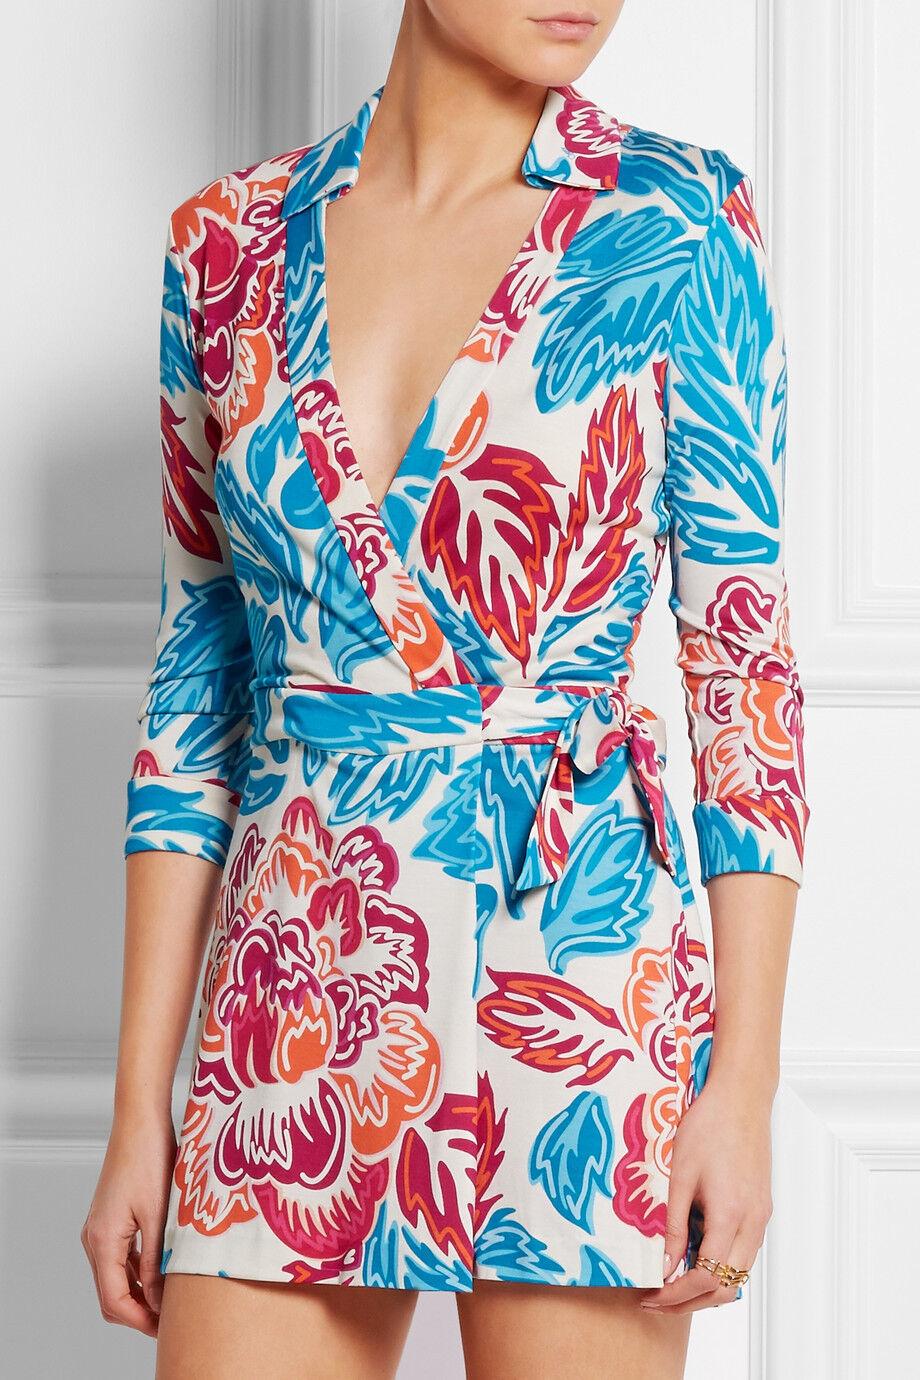 Diane Von Furstenberg Celeste Wrap Romper Giant Floral Multi Size 10